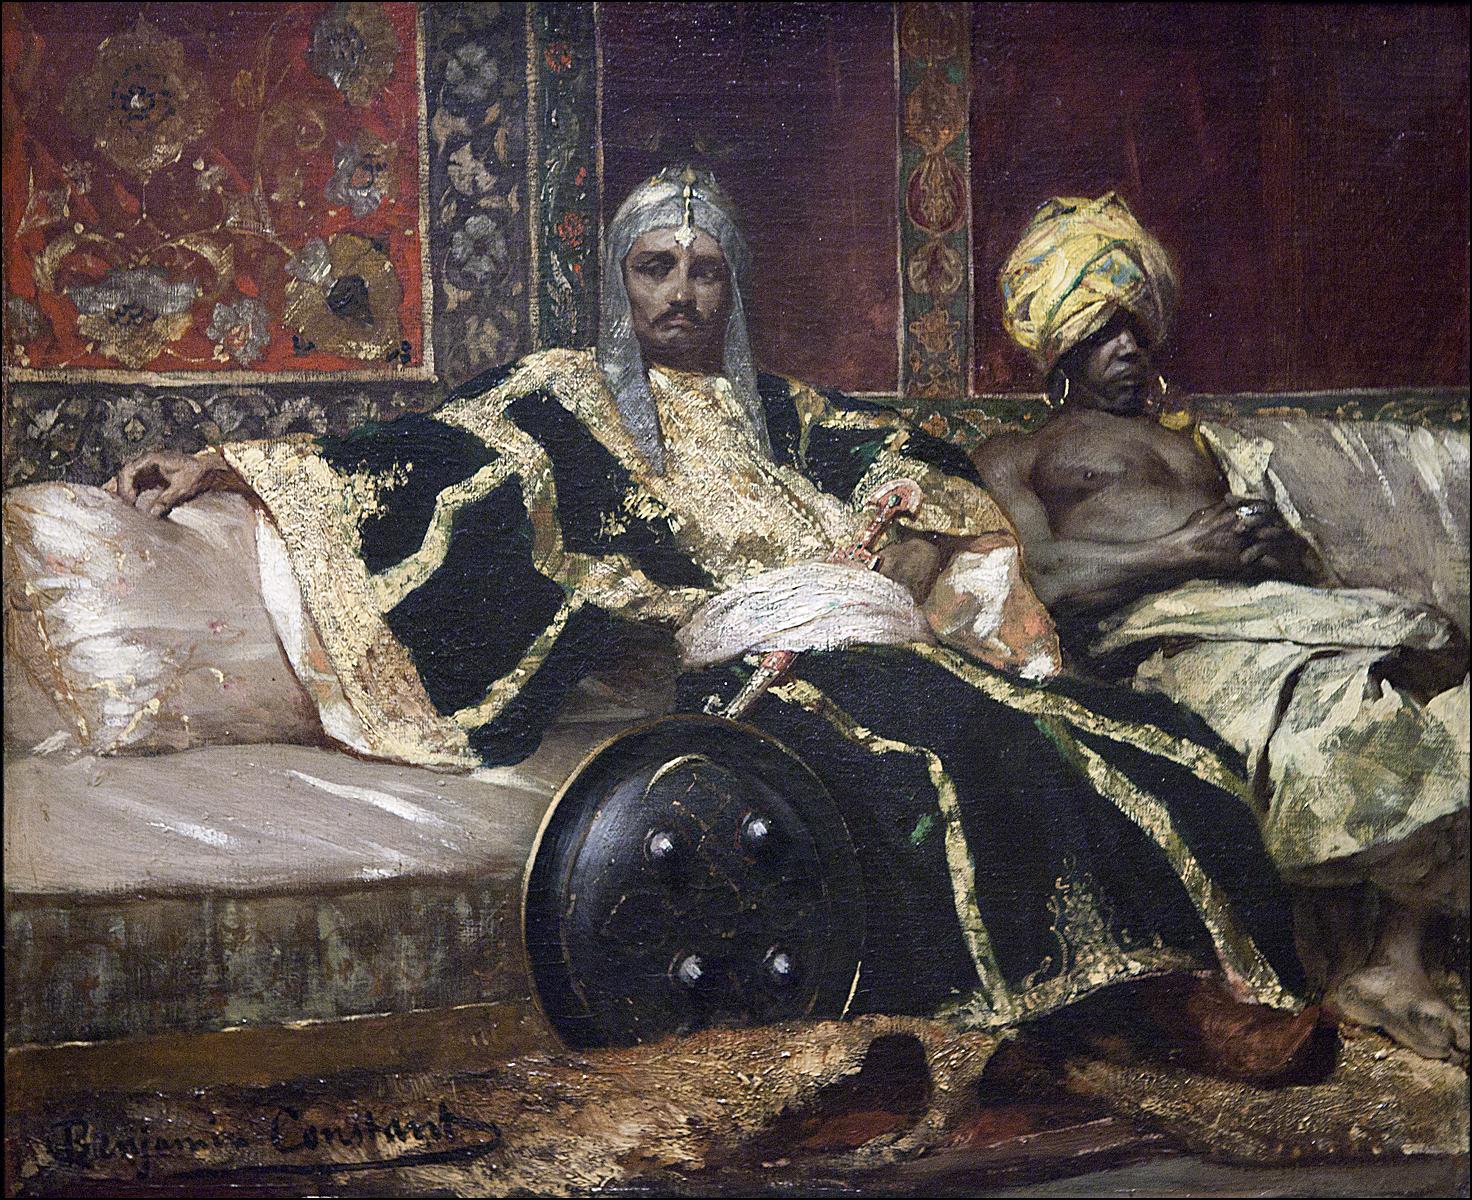 Ipad sketching marvels of orientalism at mtl beaux arts for Art et artiste